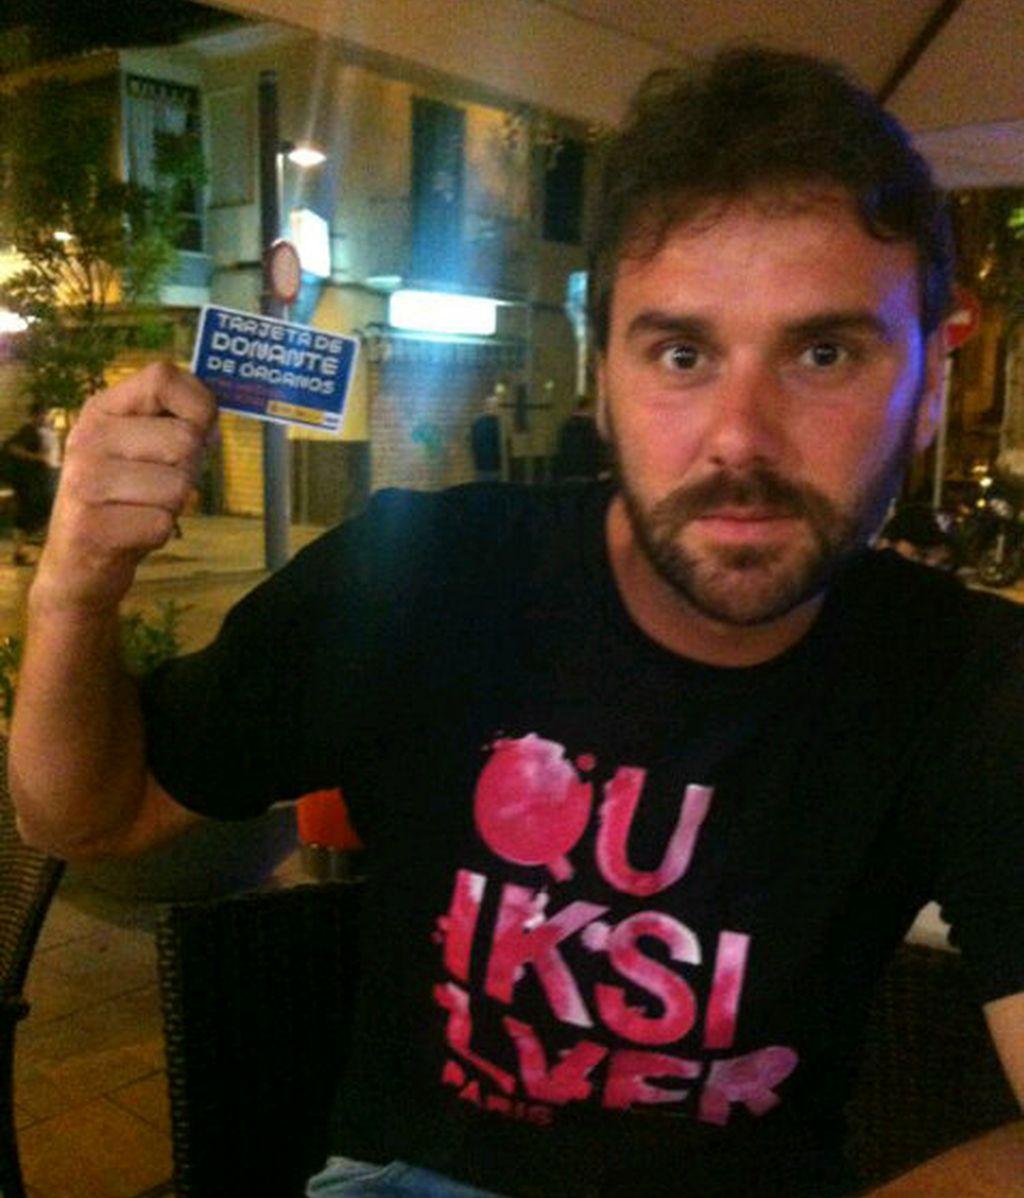 La tarjeta de Pau Bestard